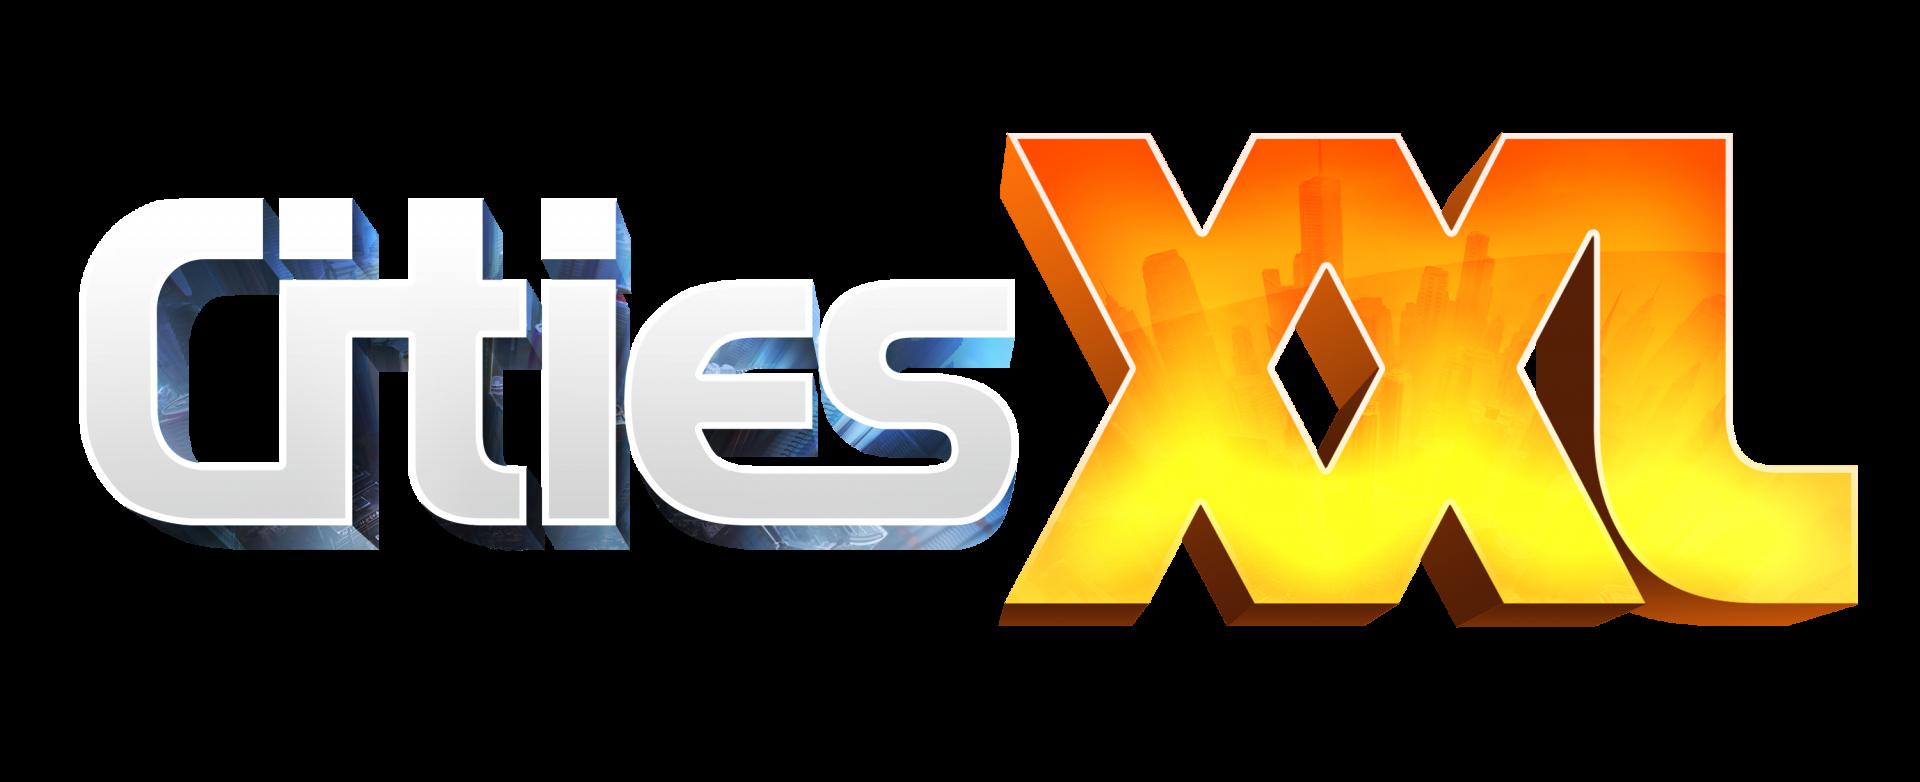 Cities XXL Pre-Order Bonus Detailed